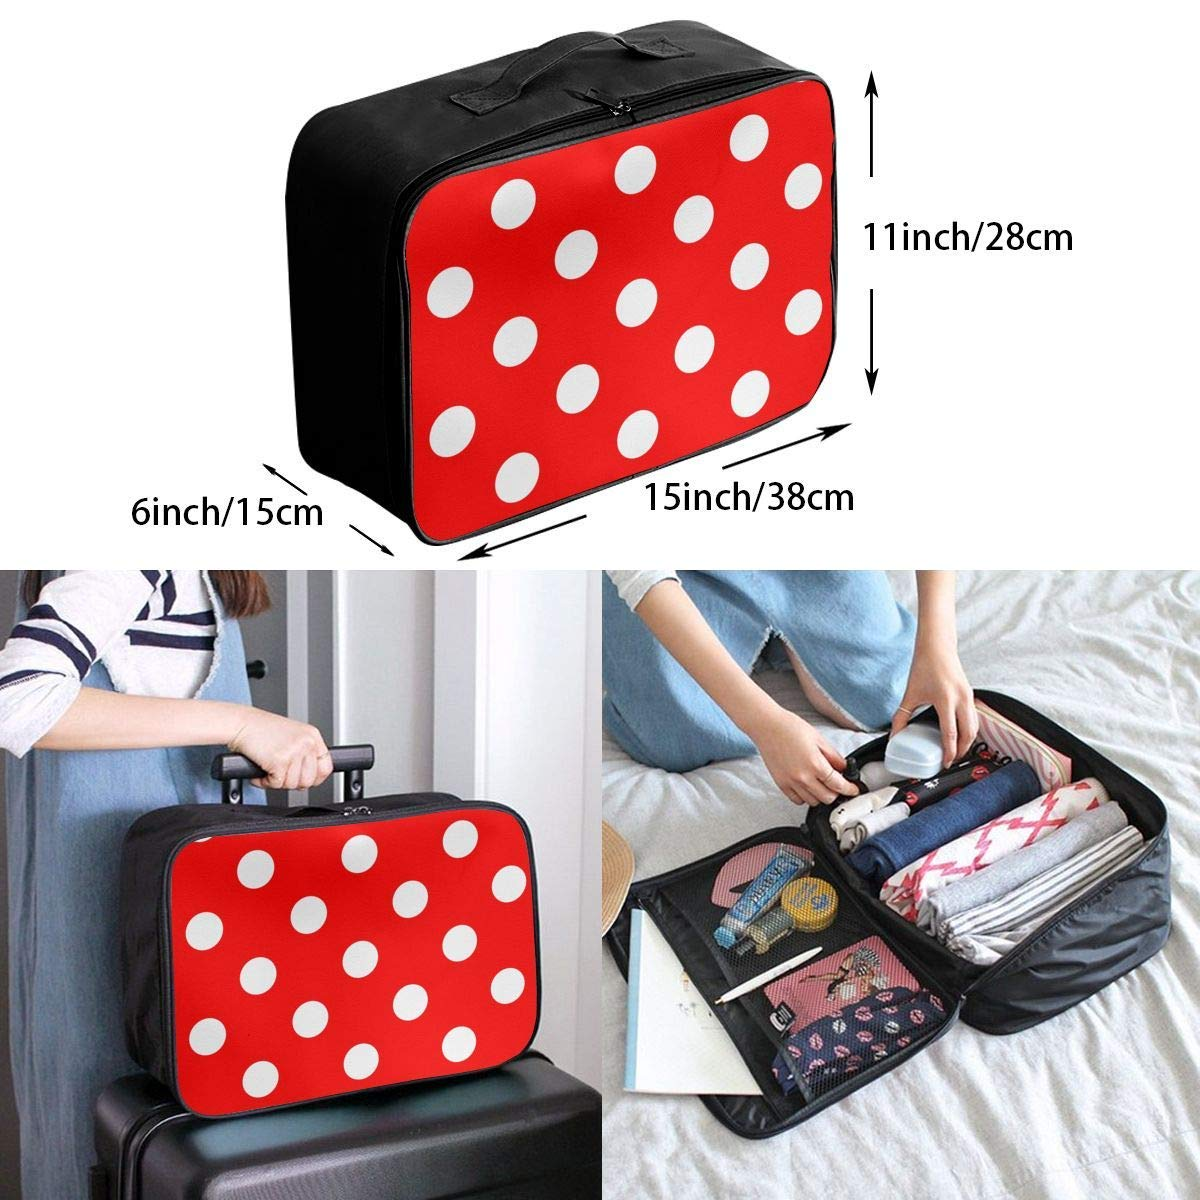 JTRVW Luggage Bags for Travel Travel Duffel Bag Waterproof Fashion Lightweight Large Capacity Portable Duffel Bag for Men /& Women Polka Dot Red